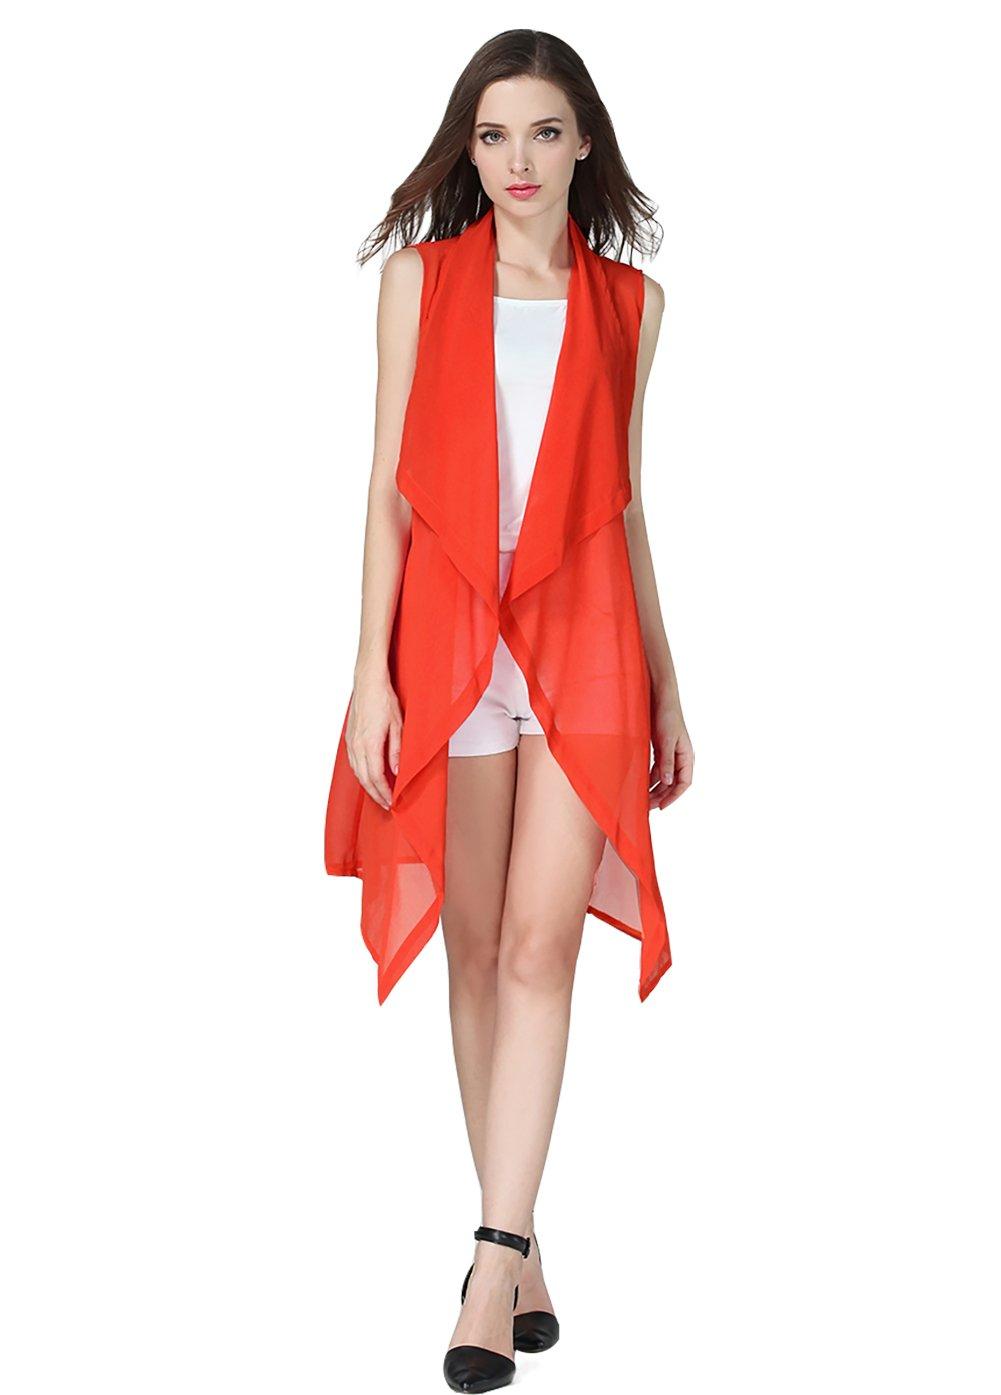 Eleter Women's Summer Lapel Sleeveless Long Waistcoat Blazer Jacket Vest Cardigan (X-Large, Orange)